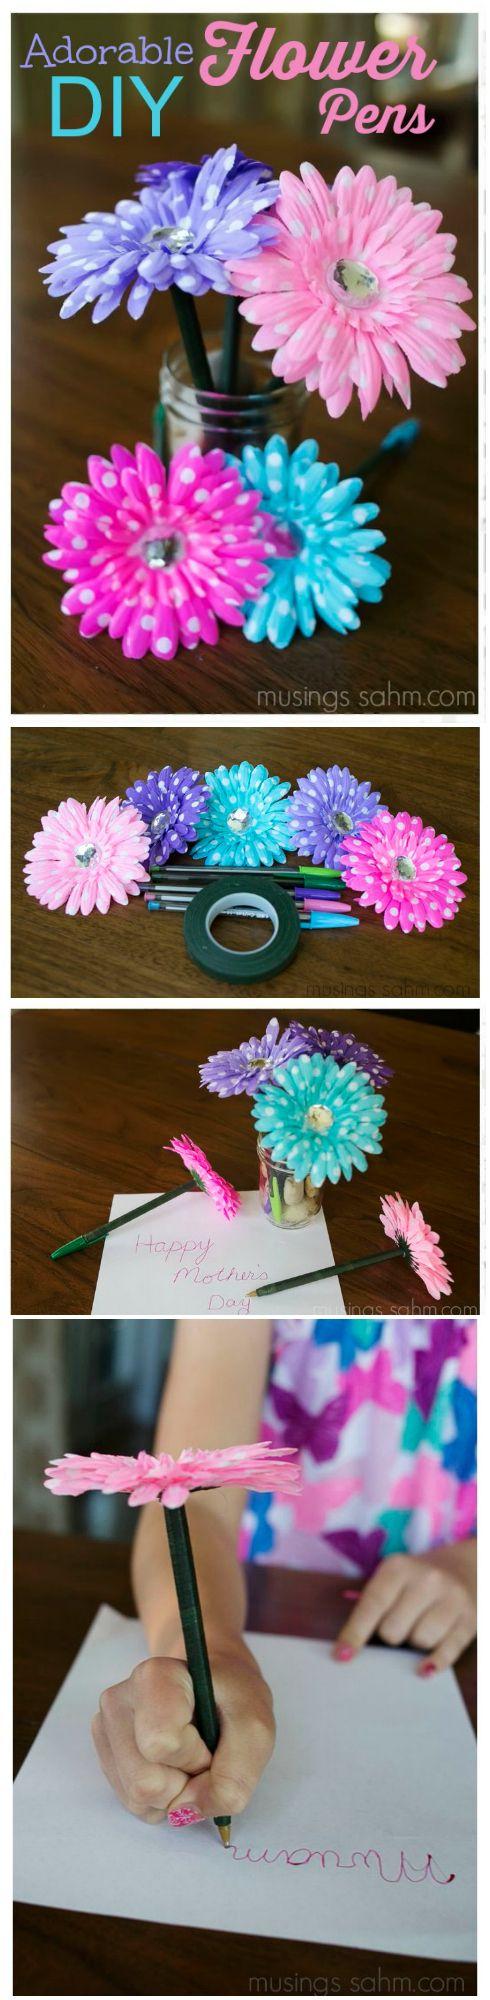 Adorable DIY Flower Pens Craft - easy enough for kids too!